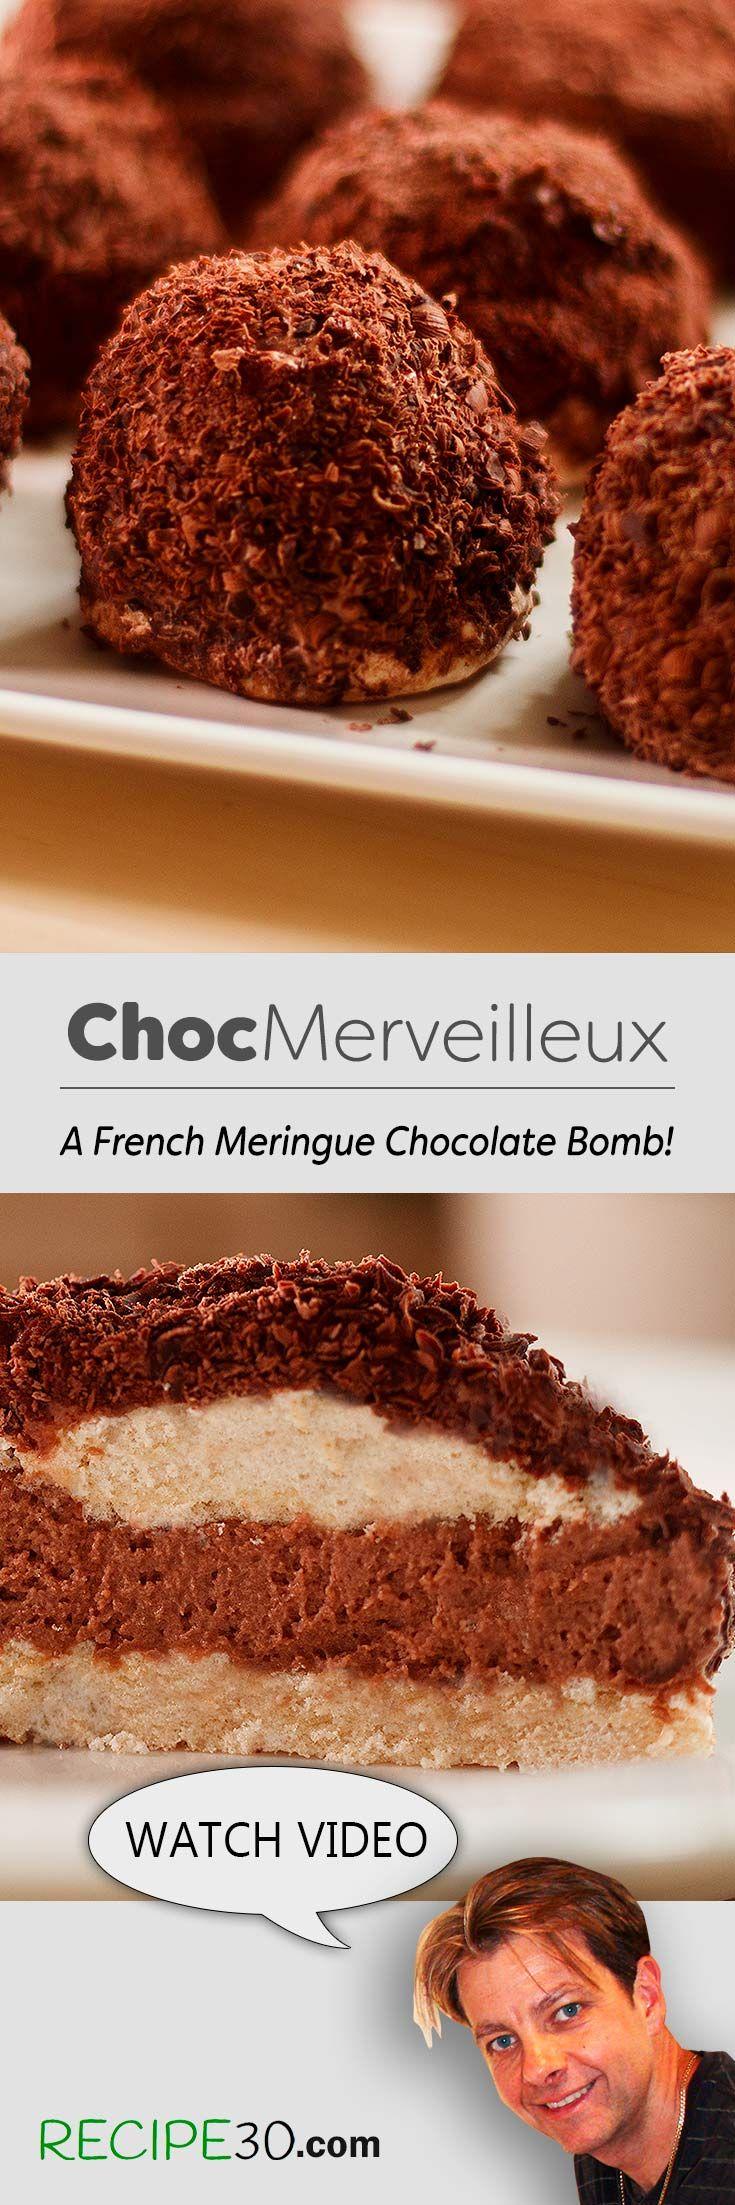 Merveilleux au chocolat A style of Crispy Meringue Chocolate Bomb